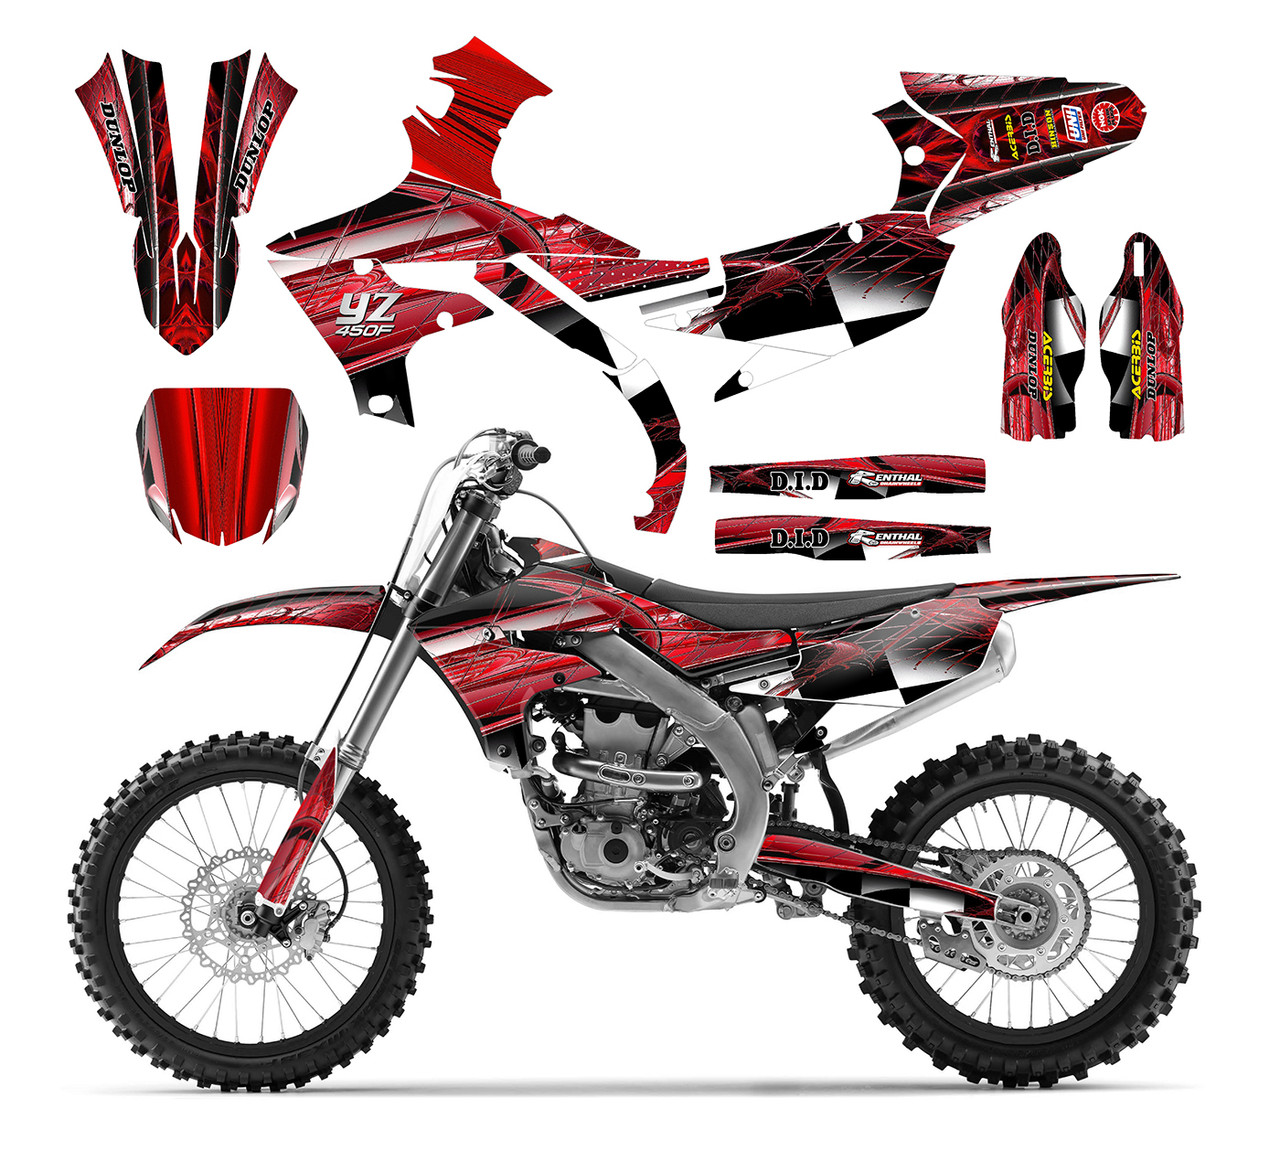 2019 2020 Yz250f Yz450f Graphics Decal Kit Design 2001